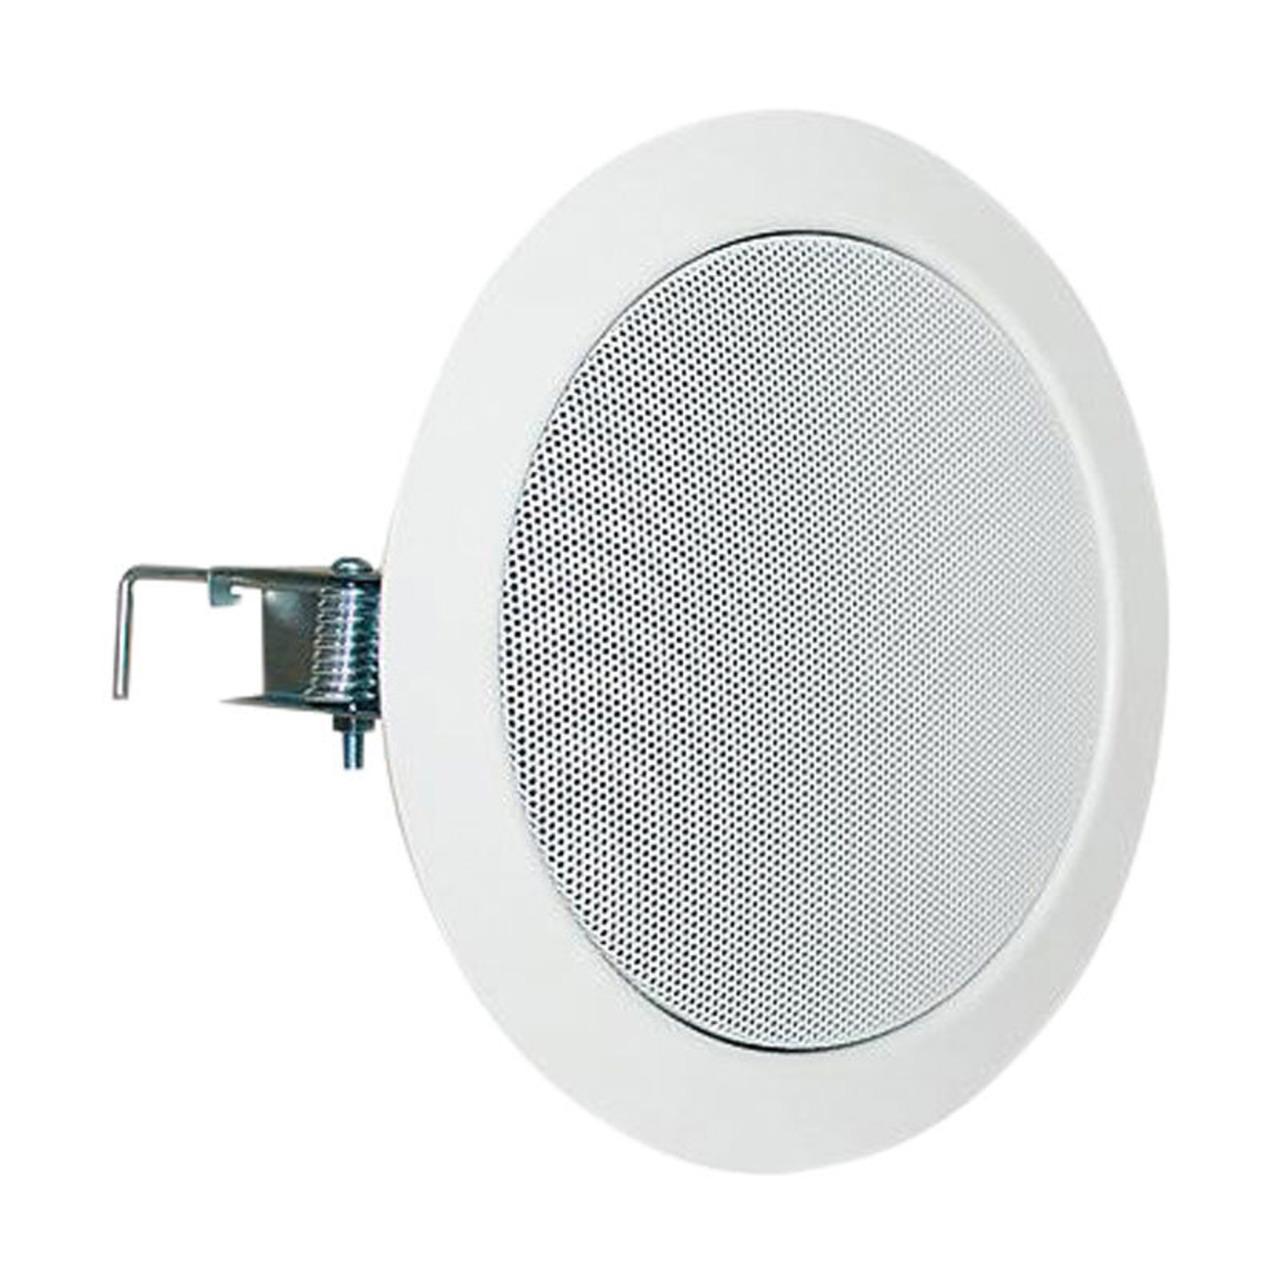 VISATON Hi-Fi-Deckenlautsprecher 13cm, DL 13/2 T, 8 Ohm